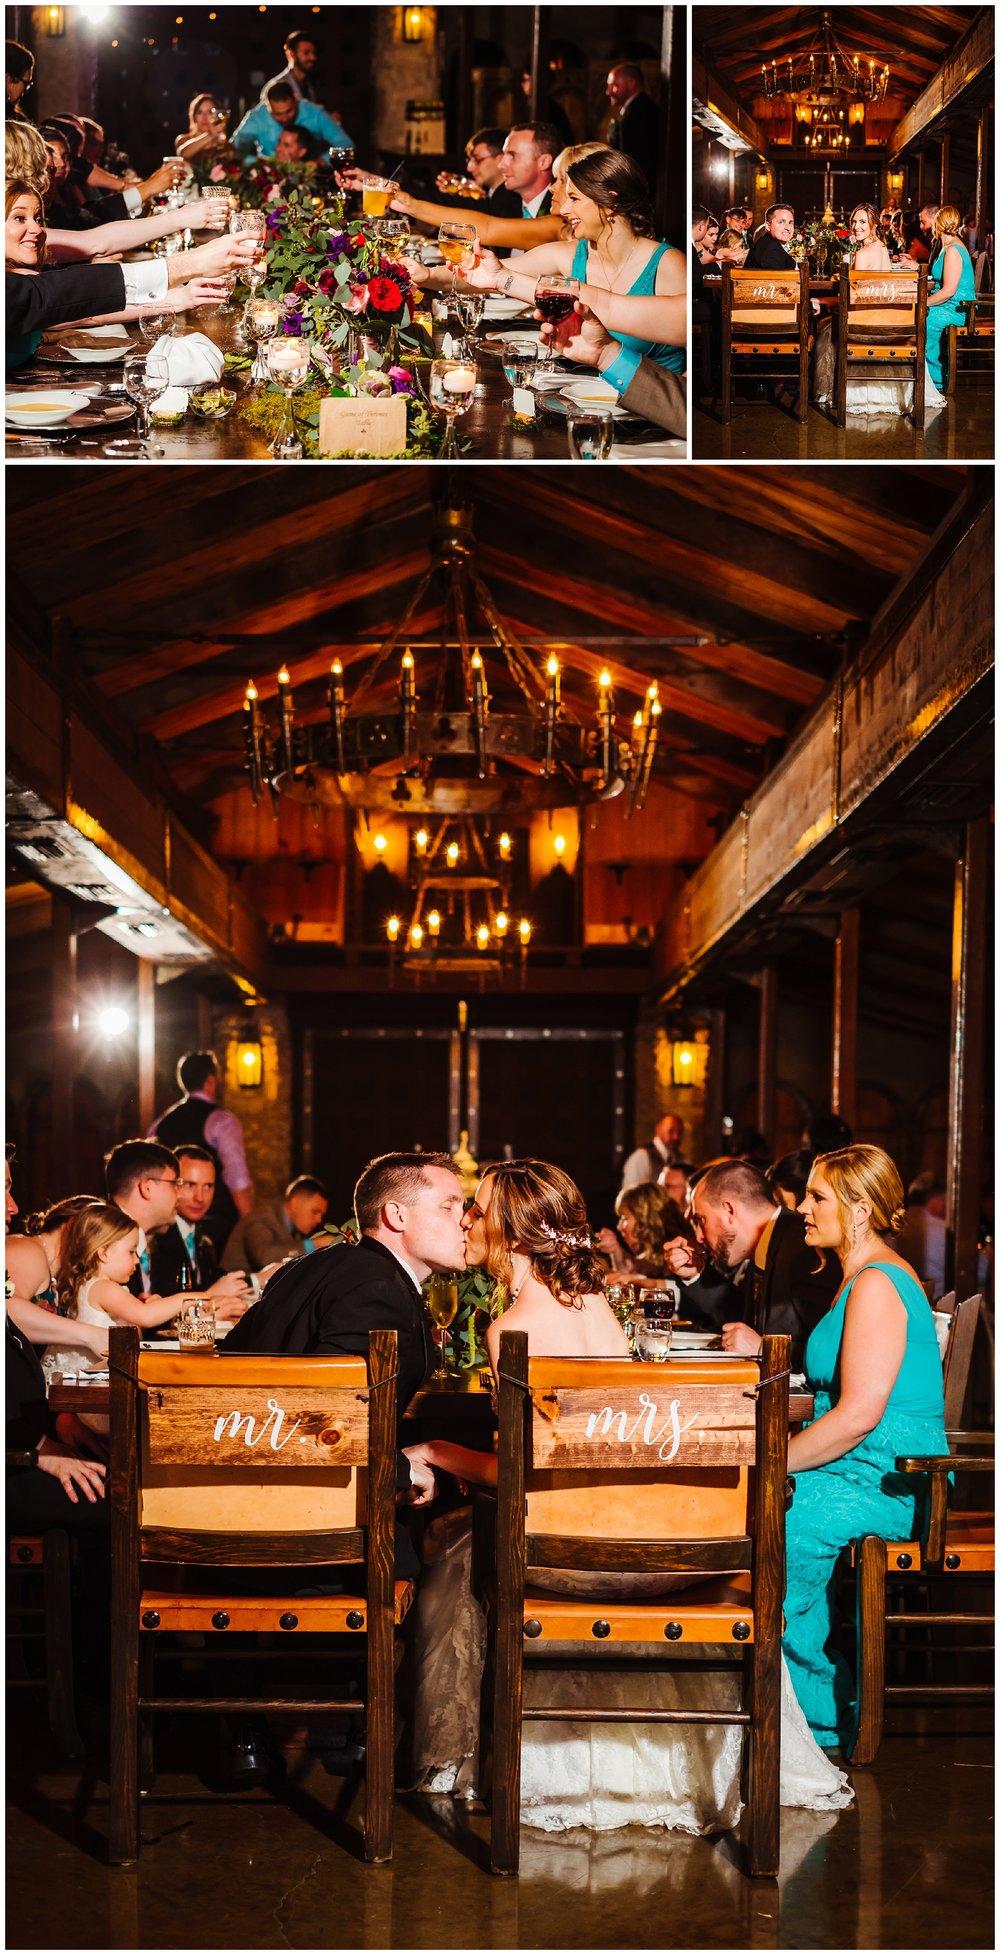 florida-destination-wedding-photographer-enchanted-tropical-miami-homestead-cooper-estate-teal_0089.jpg